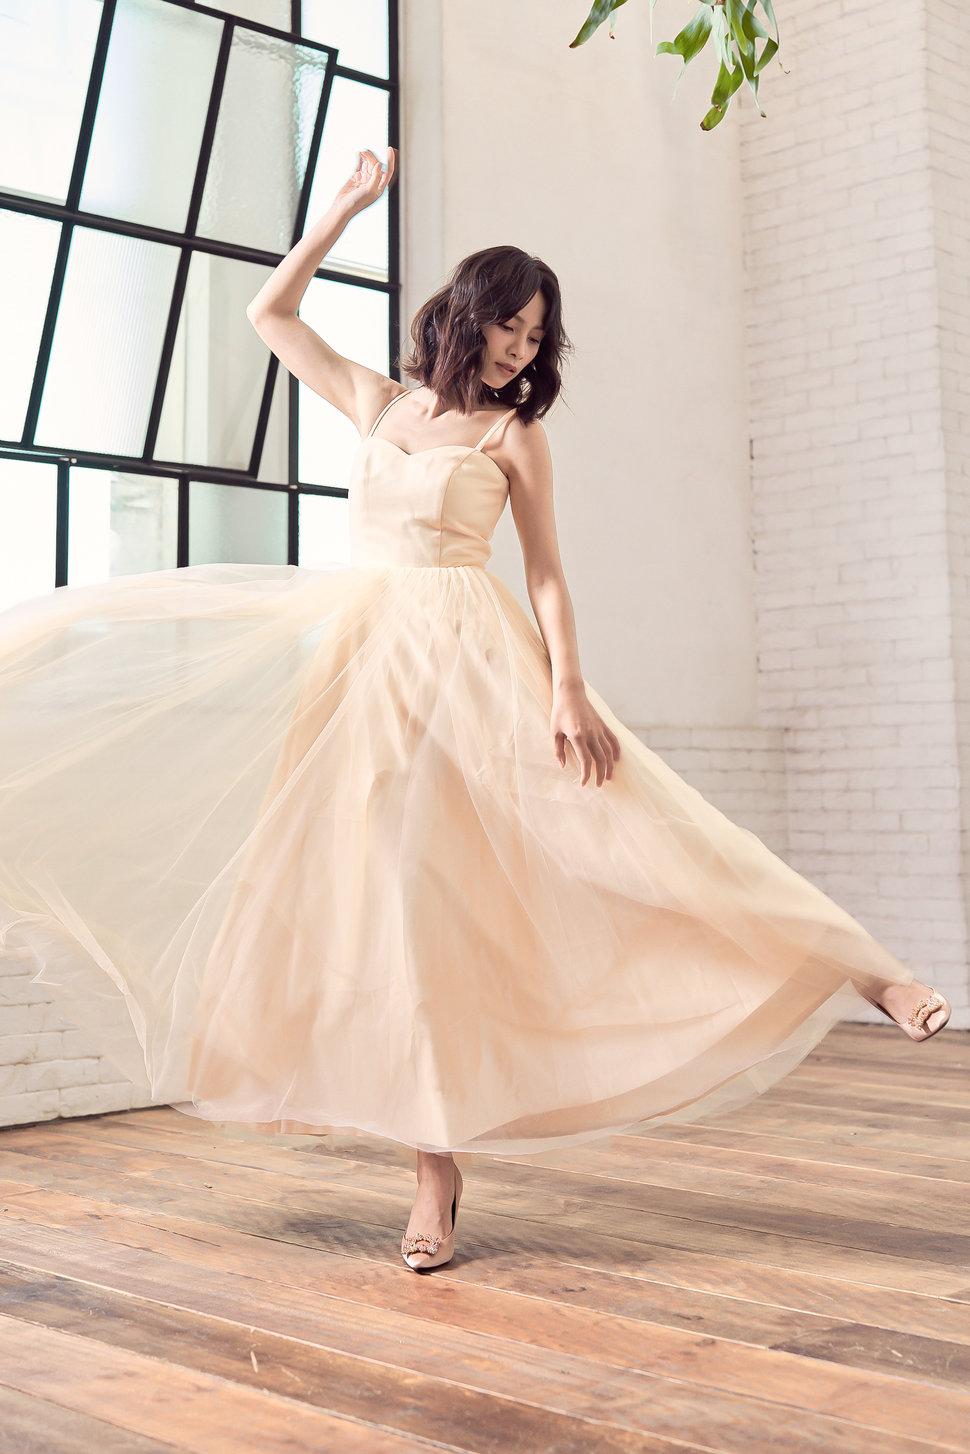 190731_0704 - Mikeshi wedding 米娔詩手《結婚吧》